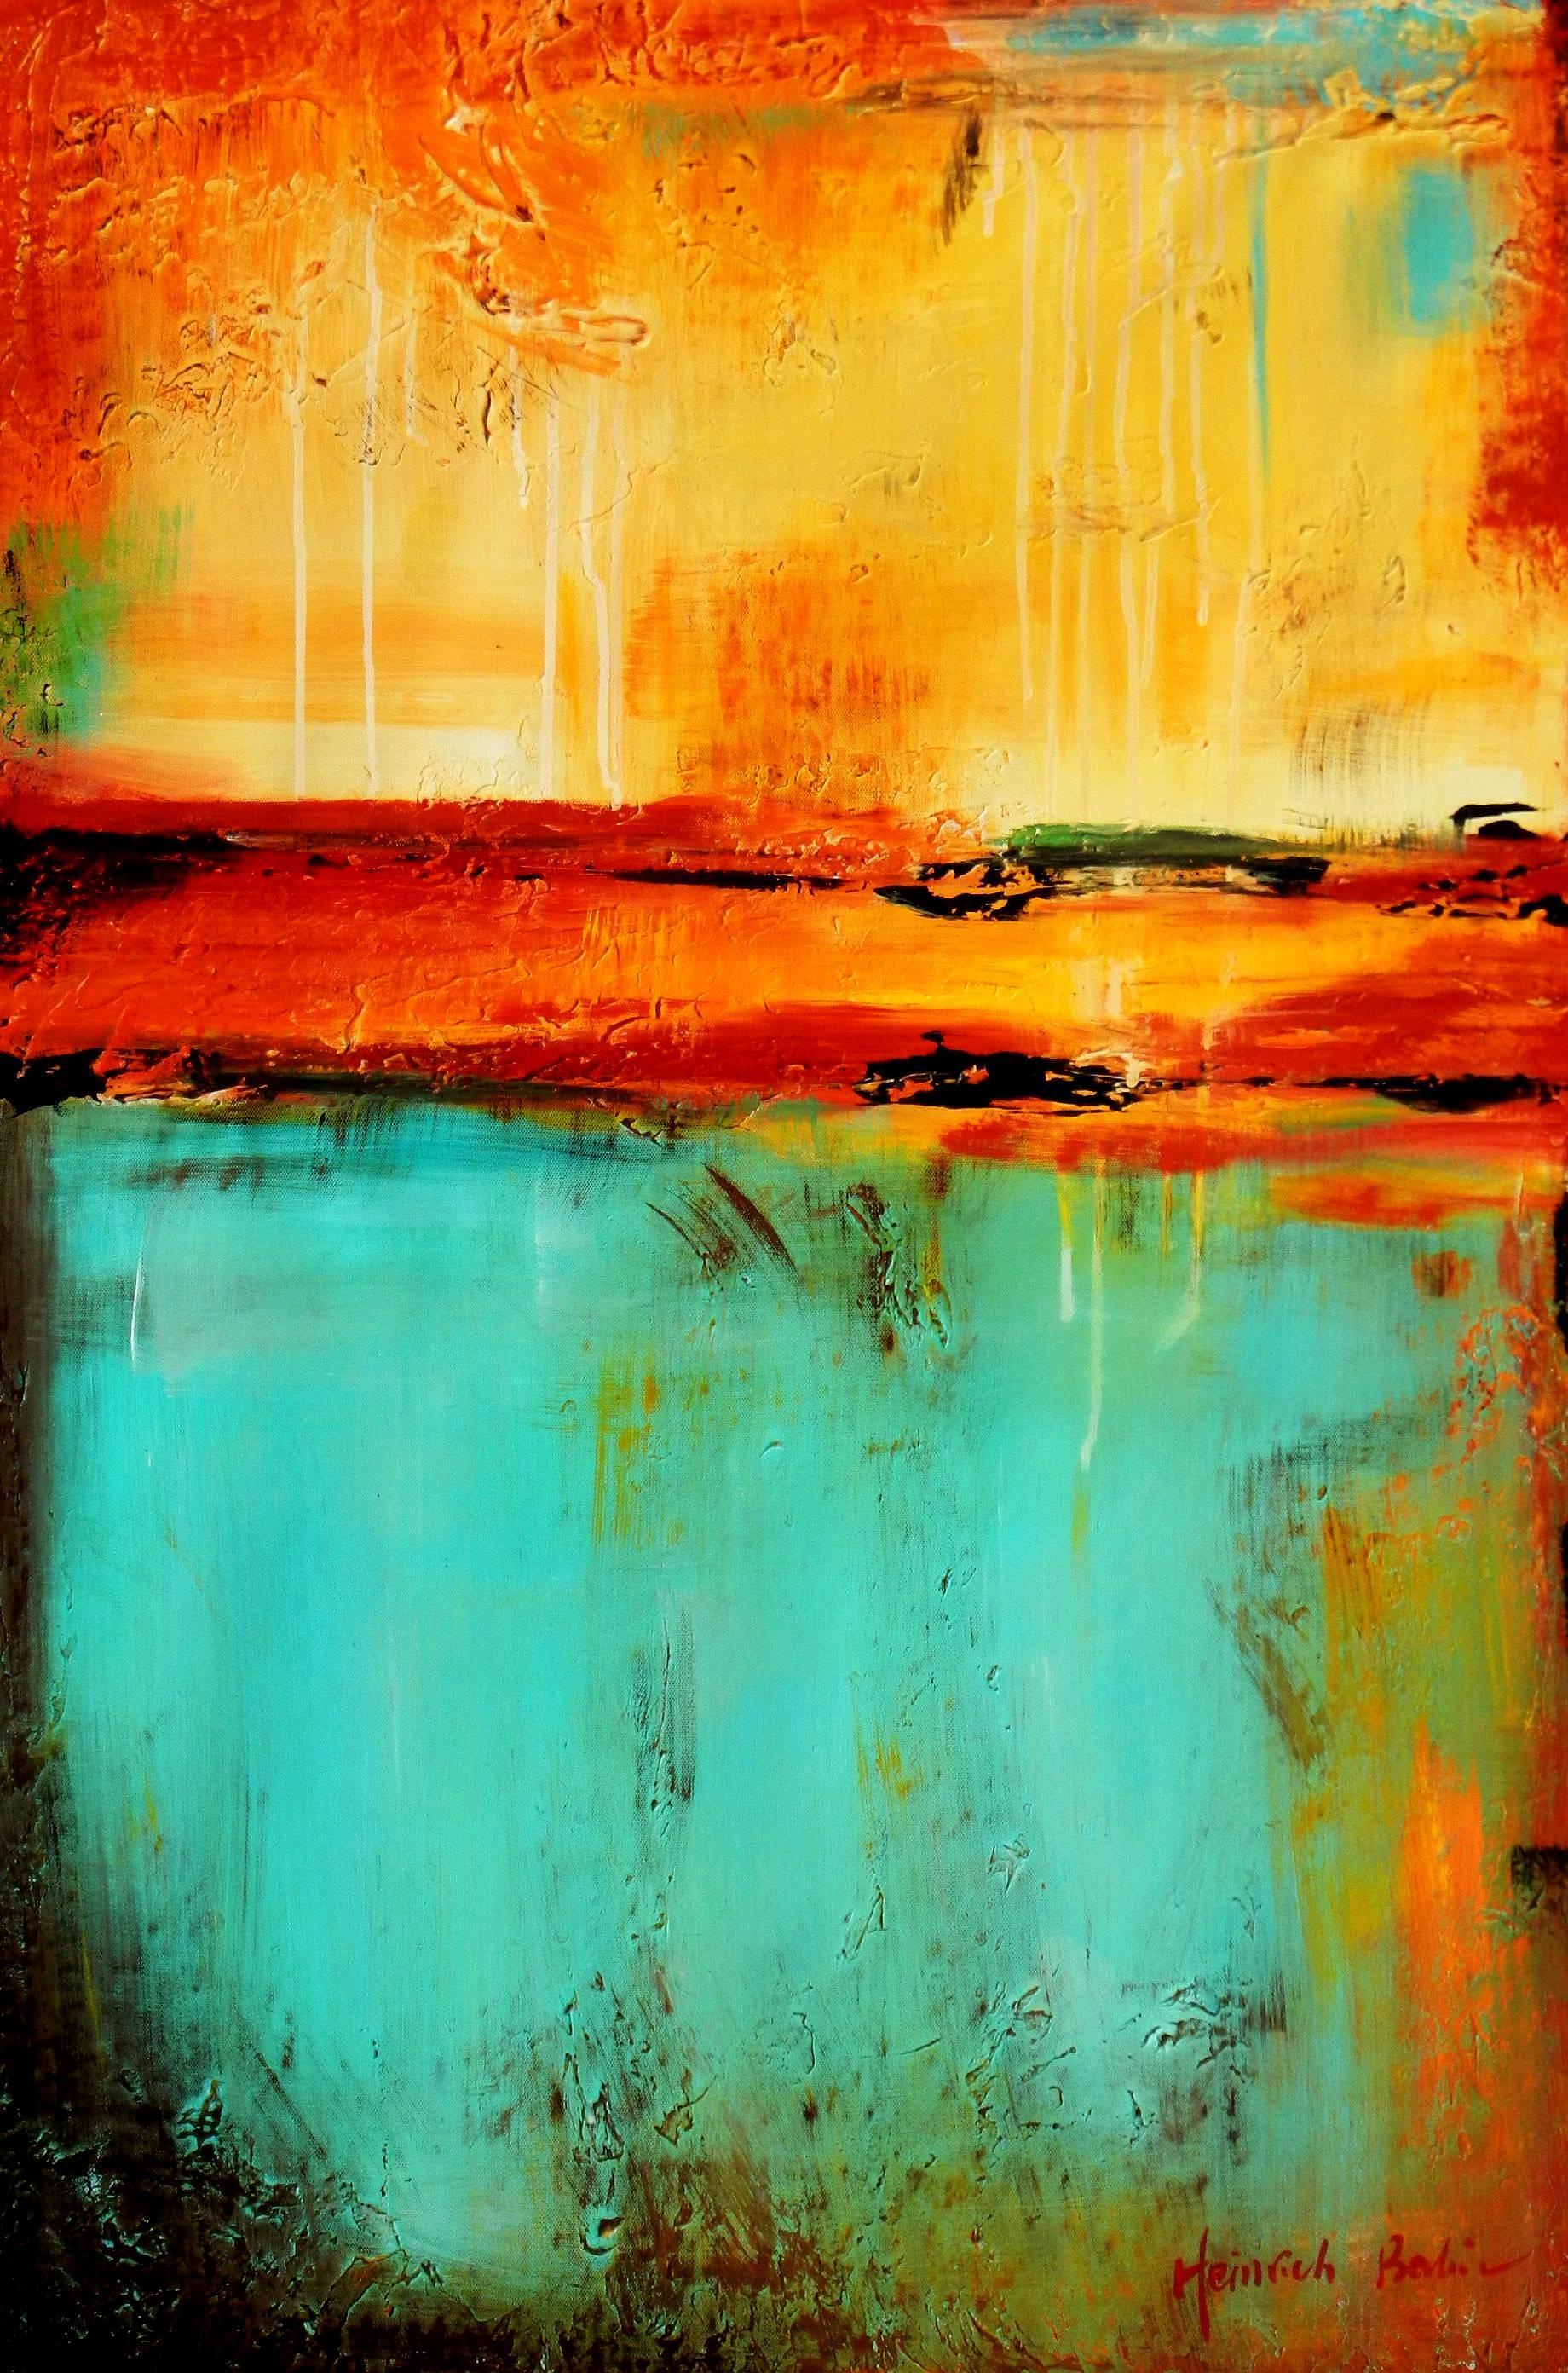 Abstract - Mirage in Babylon d96197 60x90cm abstraktes Ölbild